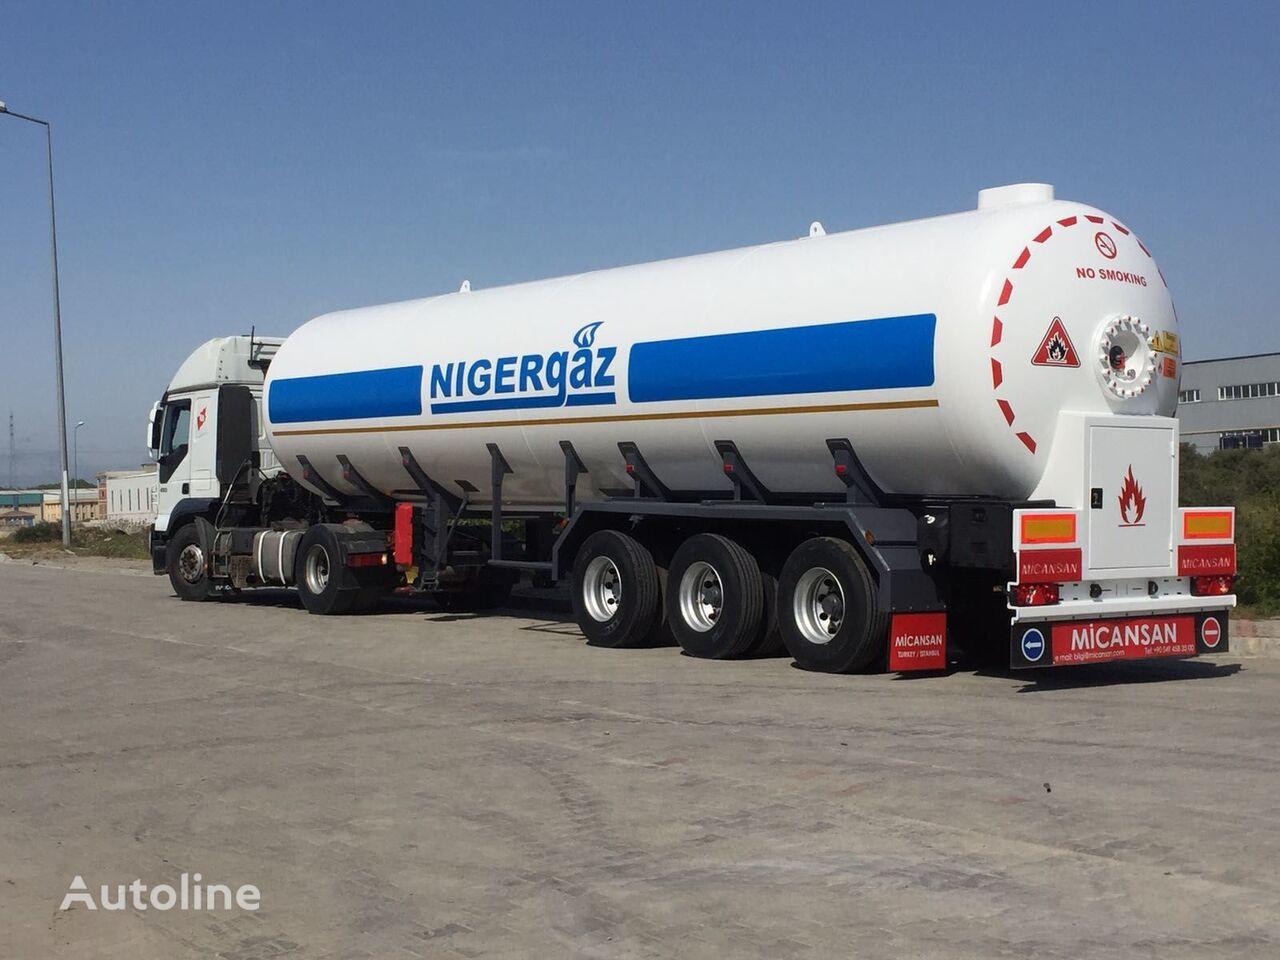 new Micansan 2020 57 M3 2+ 1 AXLES CIF LAGOS / COTONEAU 35.500 EURO gas tank trailer